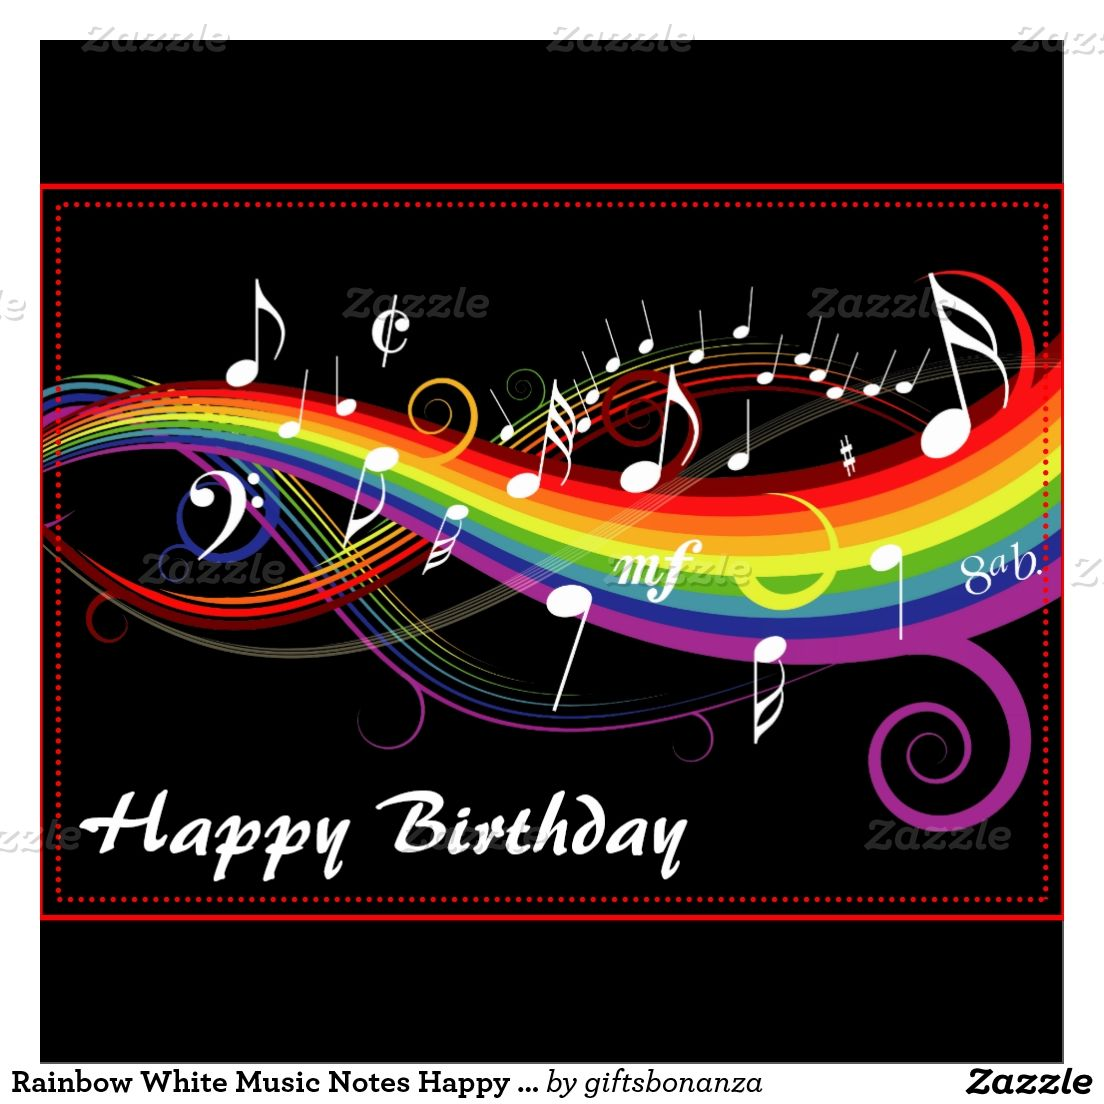 Rainbow White Music Notes Happy Birthday Card Zazzle Com In 2020 Rainbow Music Music Images Music Notes